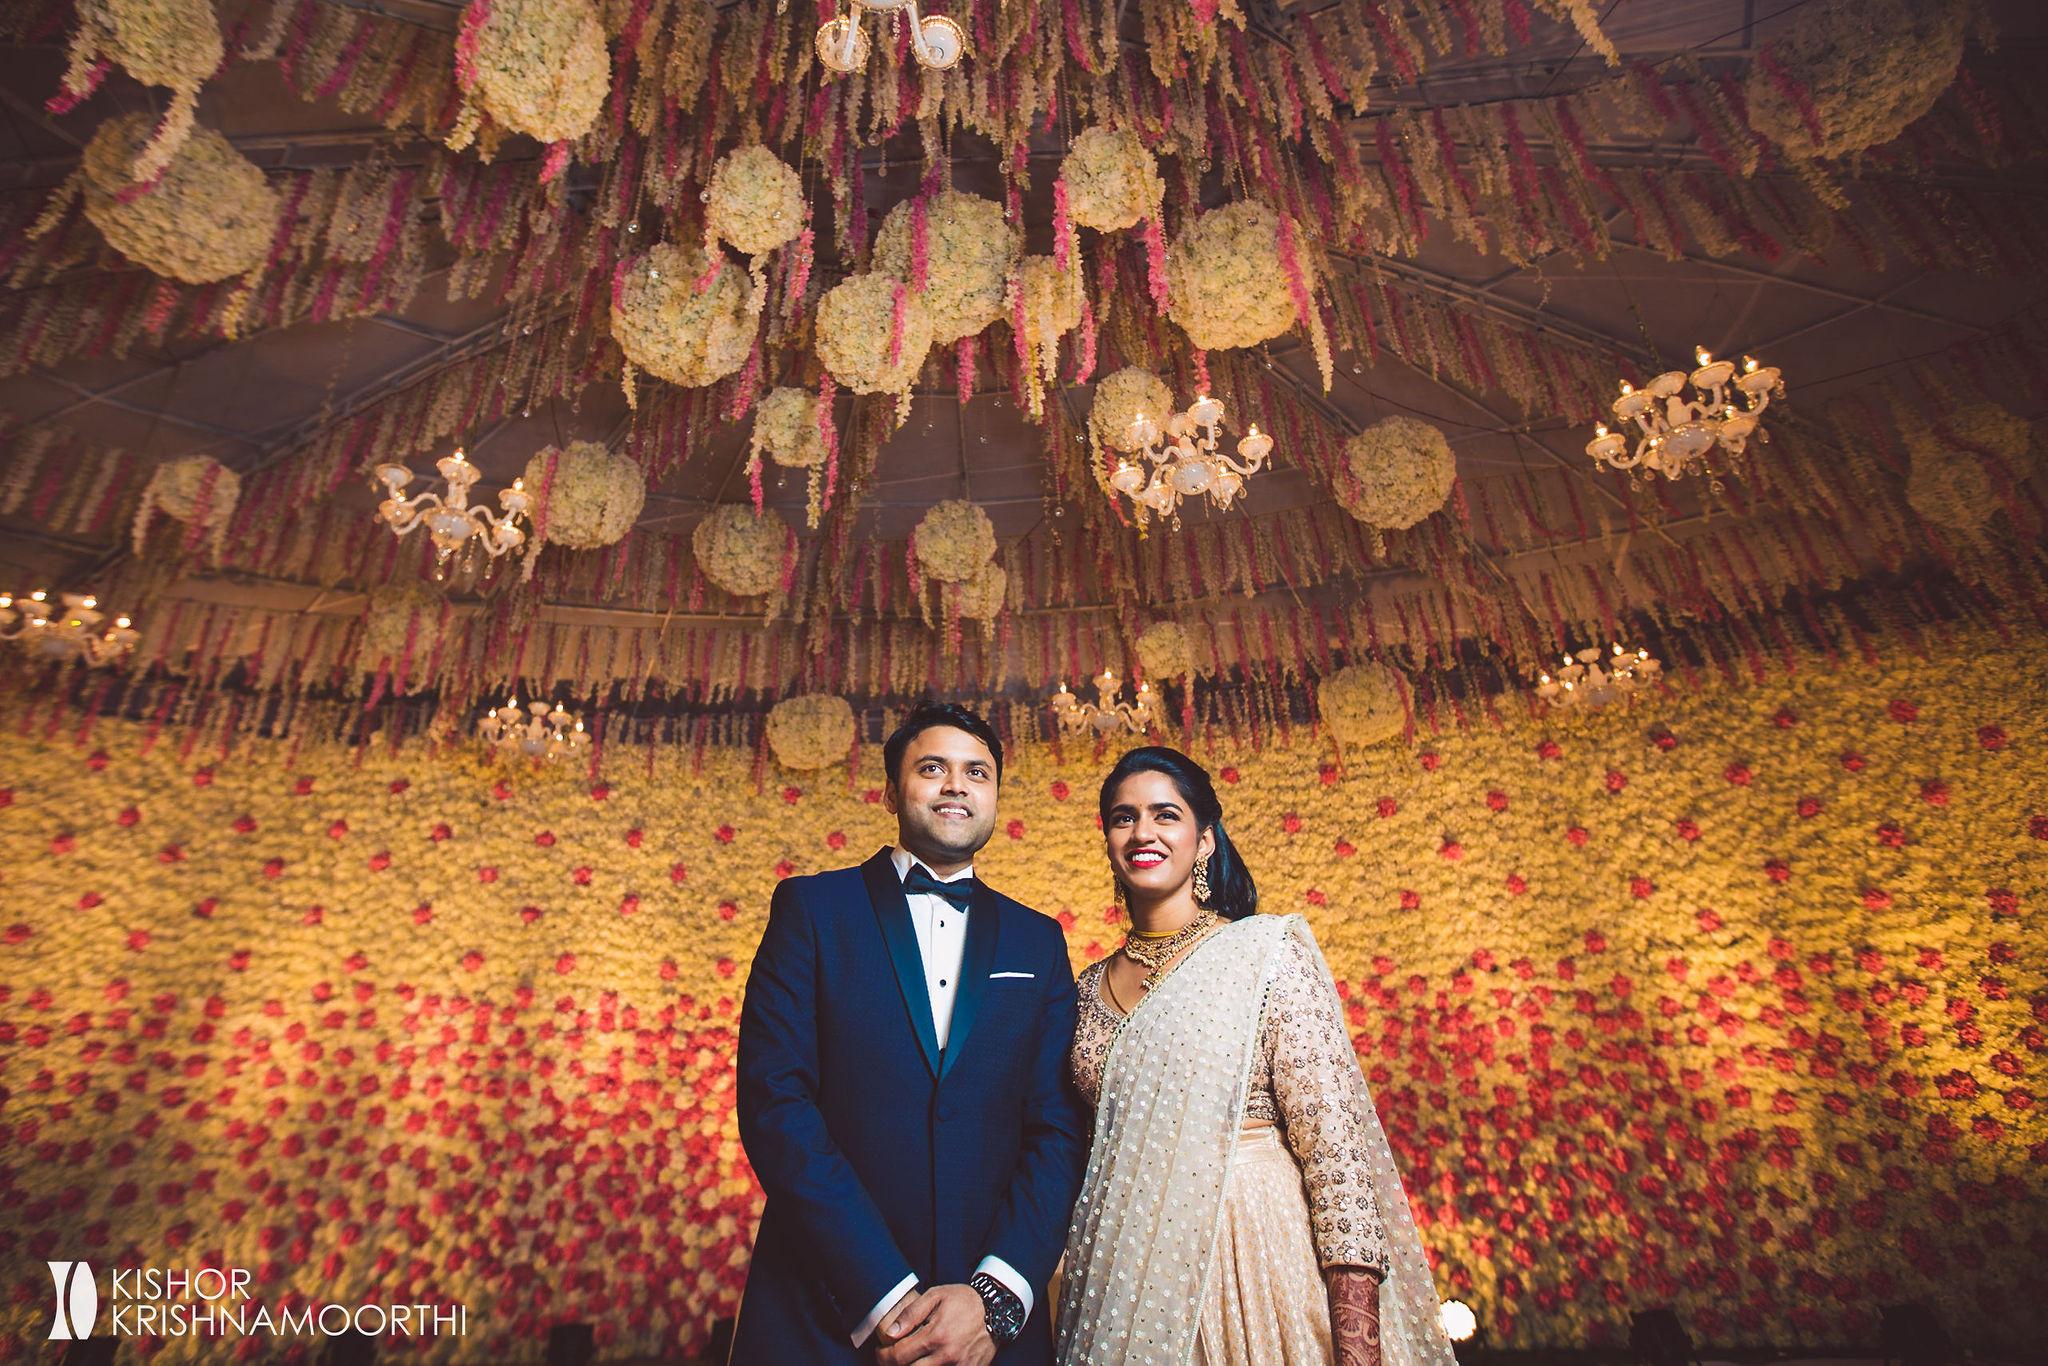 picture-prefect-pellikuthuru-pellikoduku-bride-groom-lovely-couple-wedding-season-telugu-south-indian-marriage-kishorkrishnamoorthi